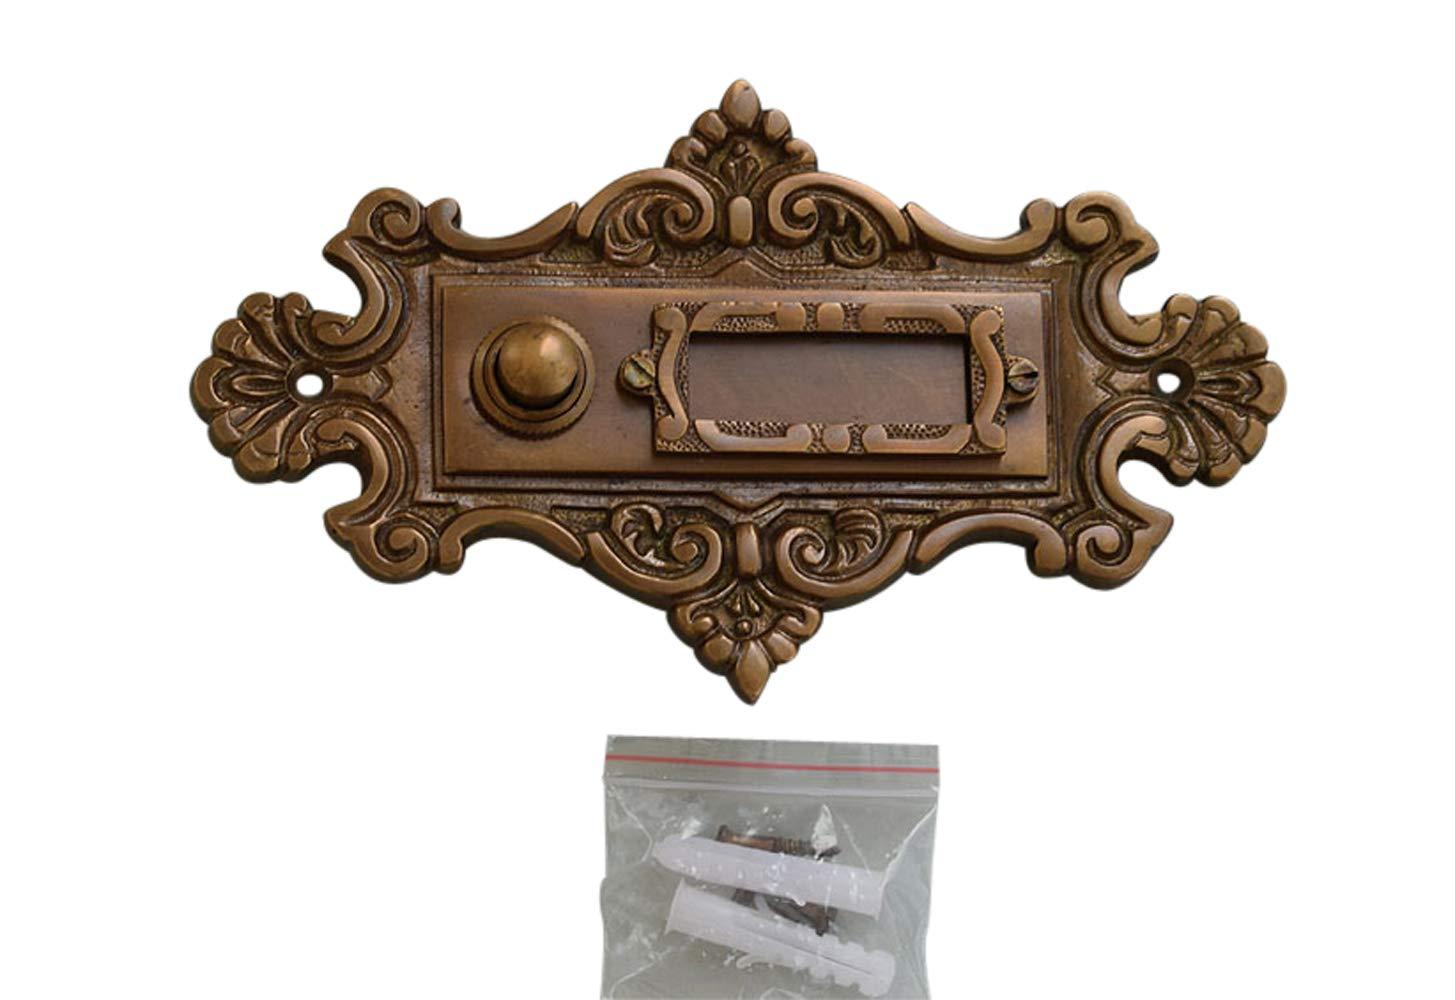 Luxusgriffe Antik Messing Klingel 1 Türklingel Klingelschild Klingelplatte K88A